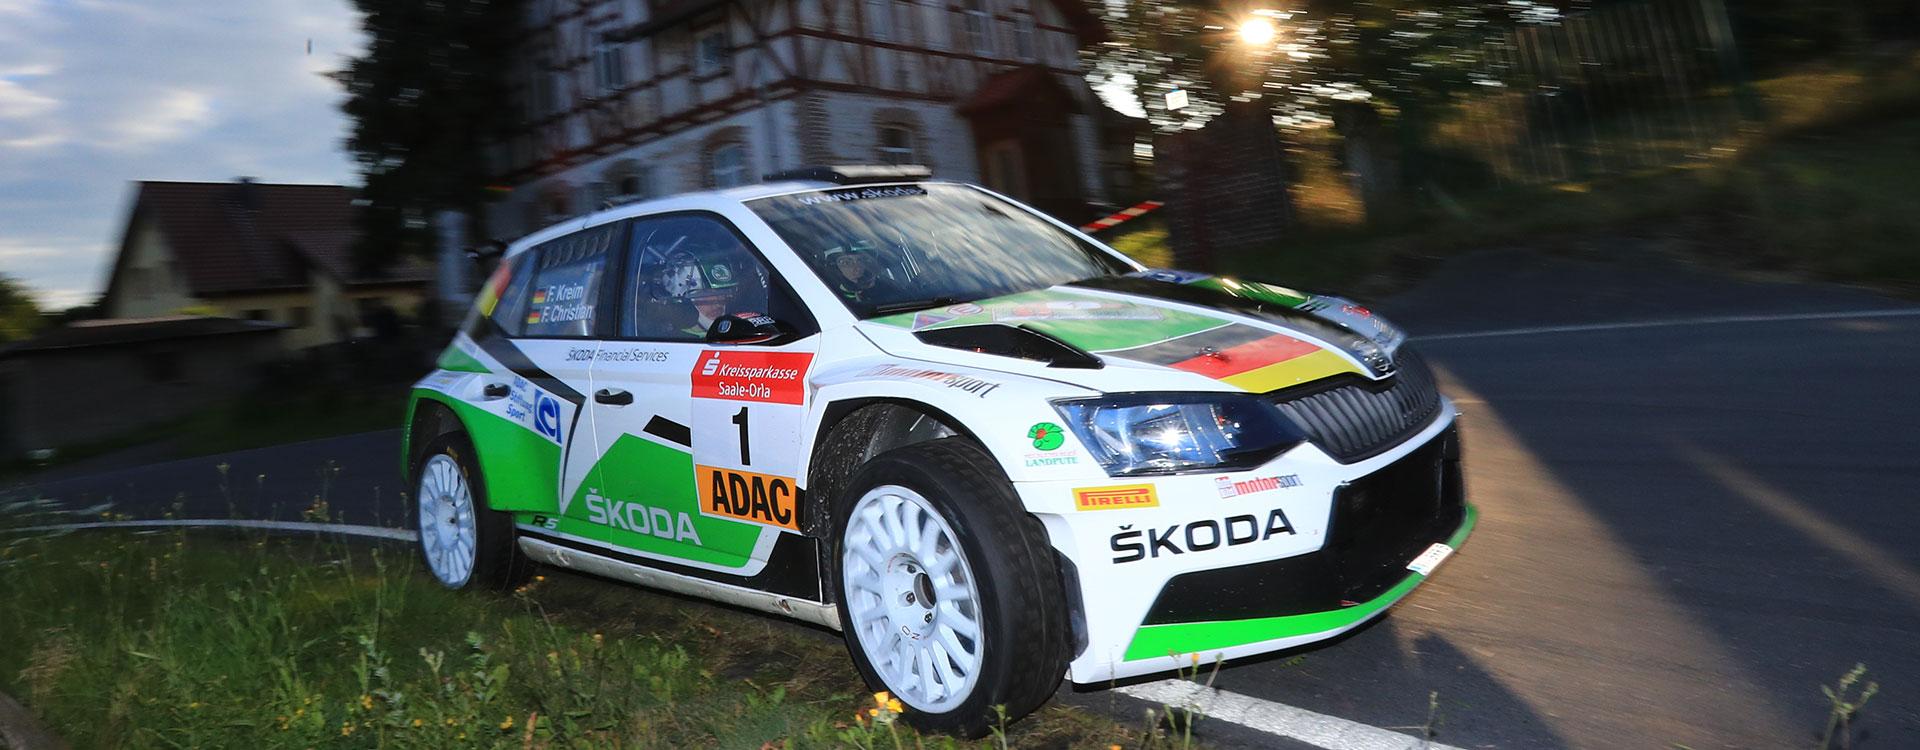 PHOTO: Fourth DRM win for Kreim at the Thüringen Rallye